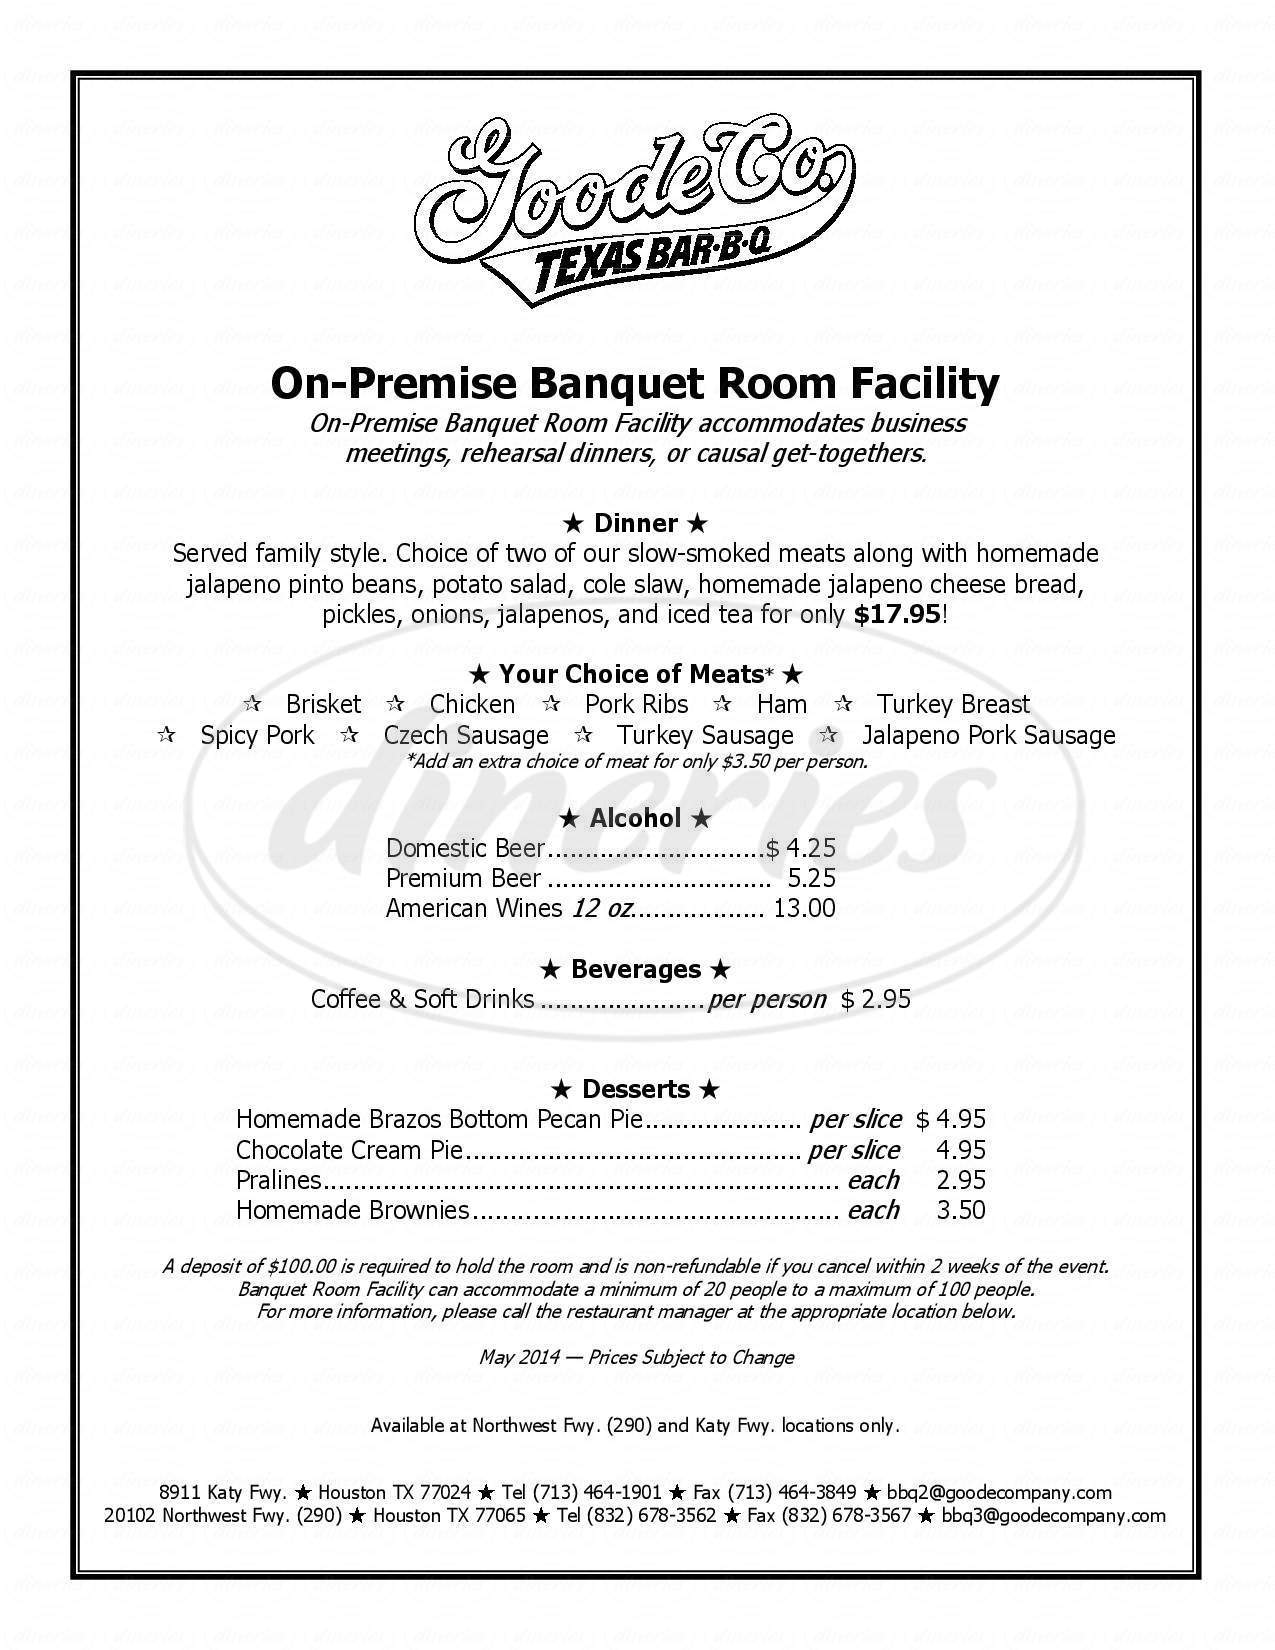 menu for Goode Company Barbeque